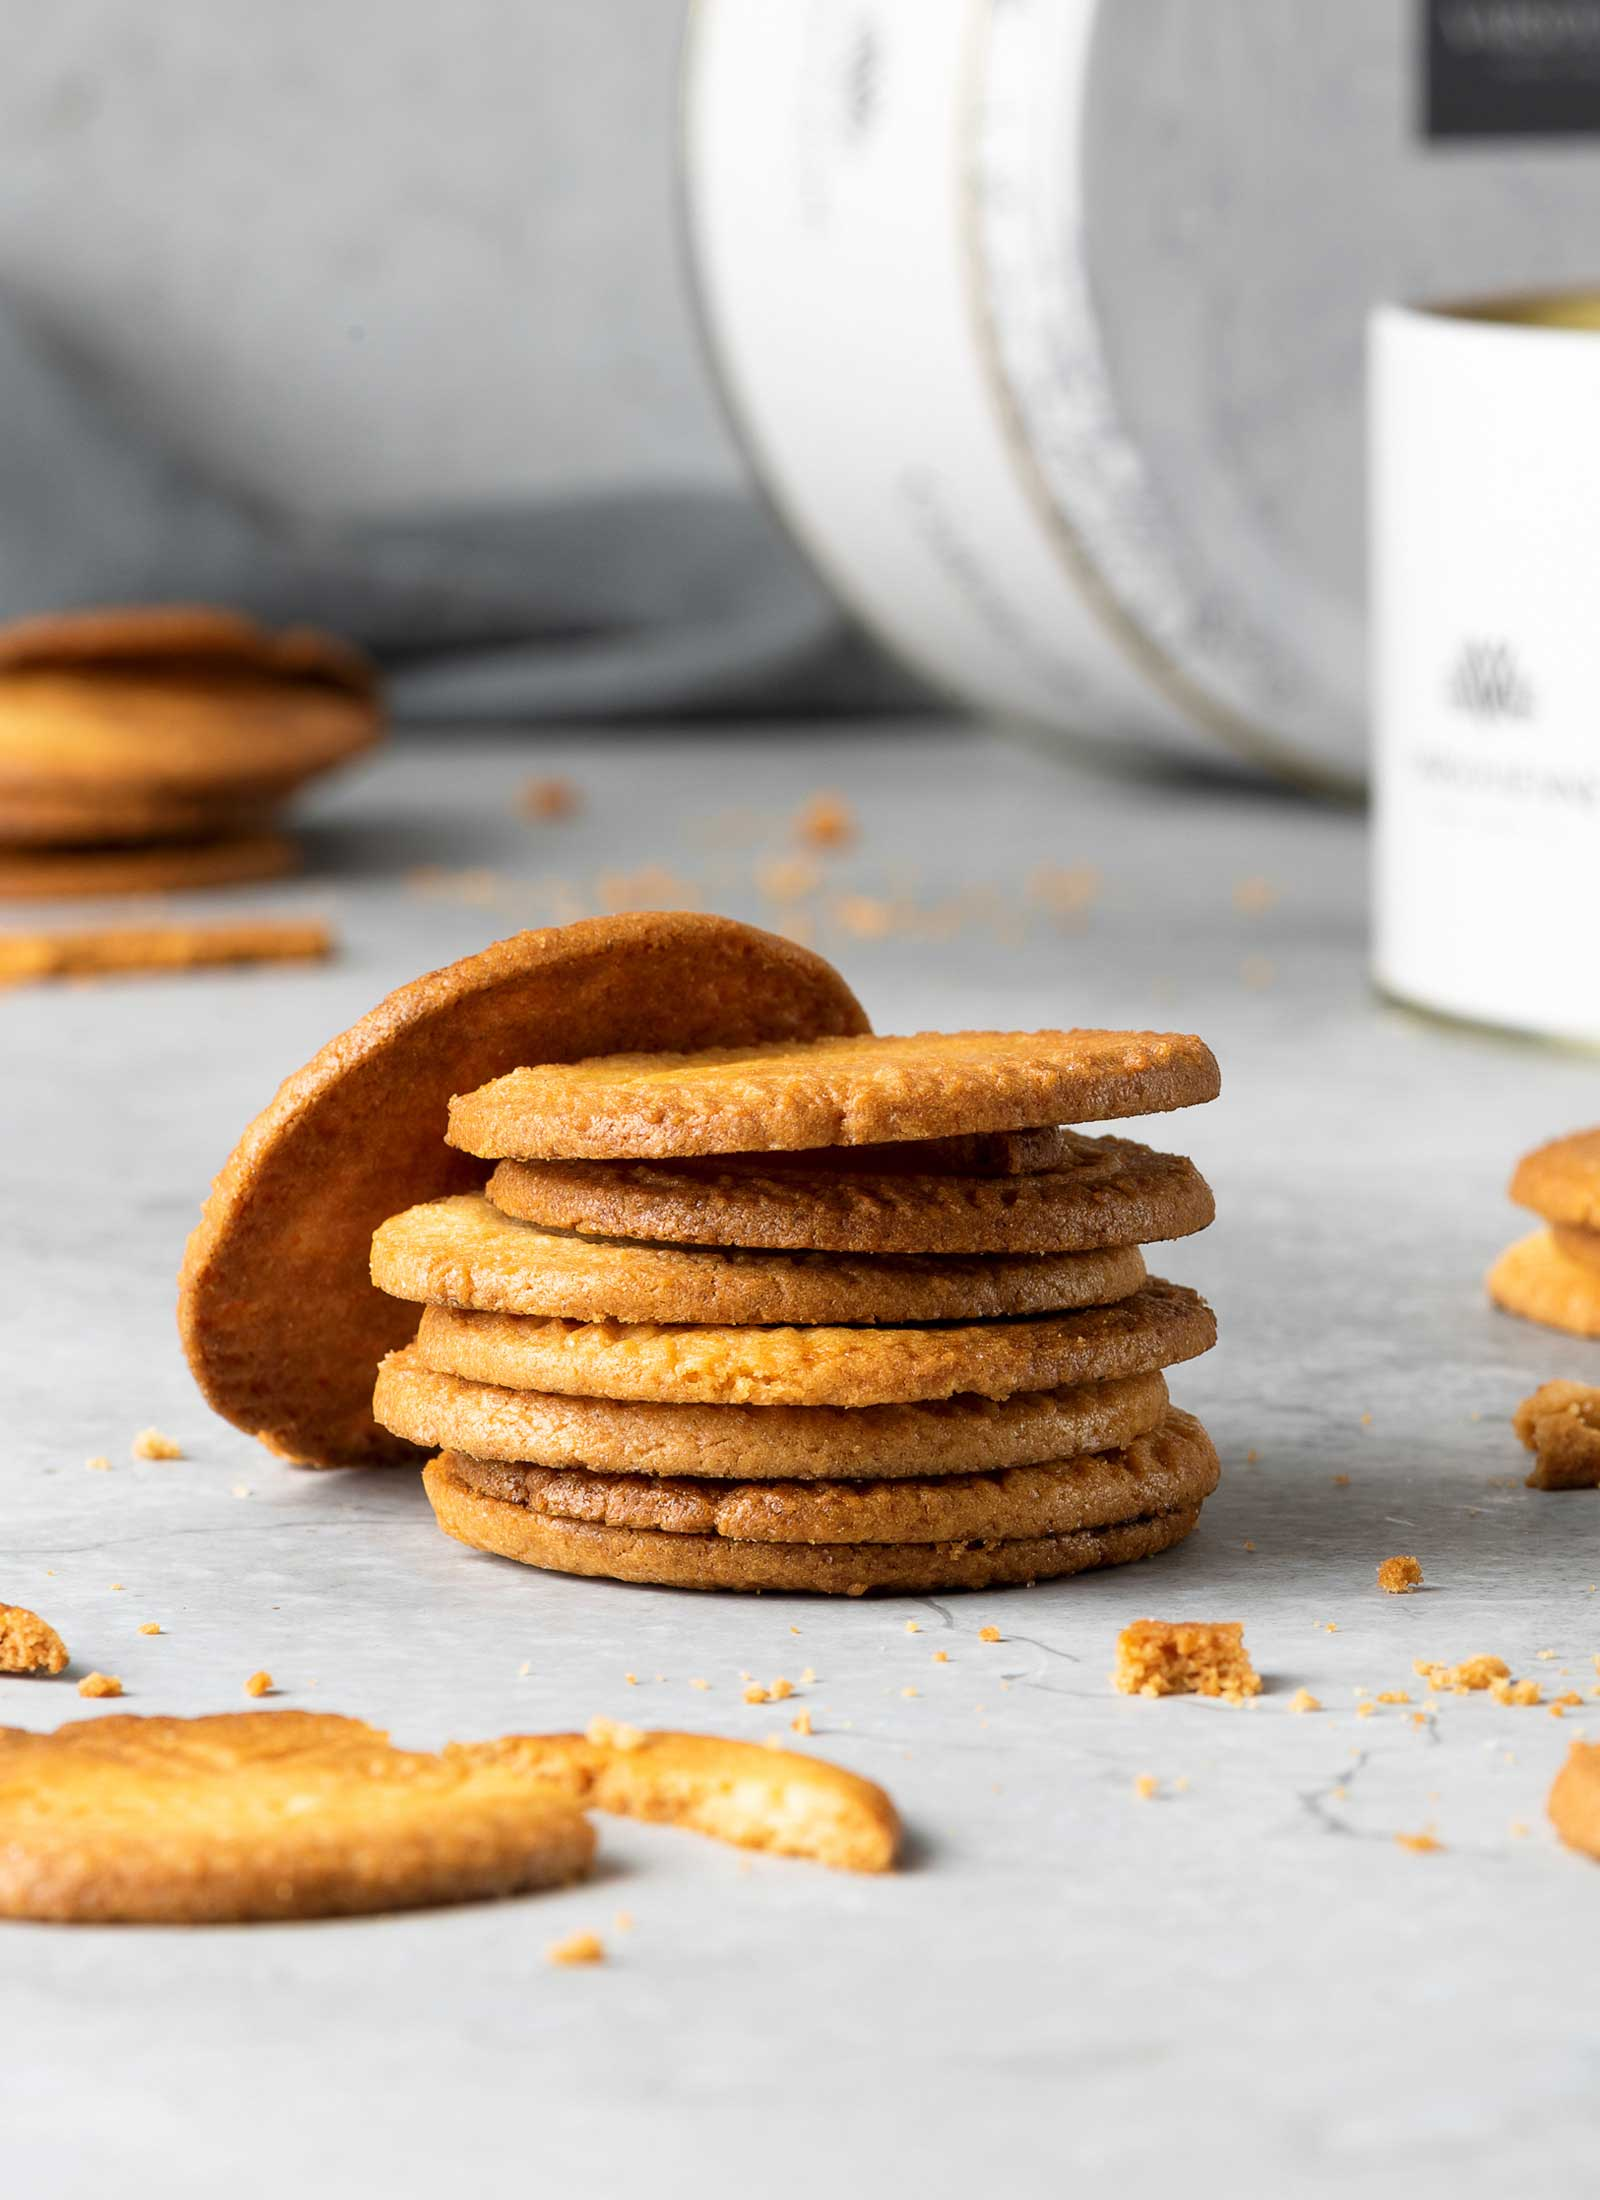 galletas-mantequilla-apiladas-varsovienne-estudio-como